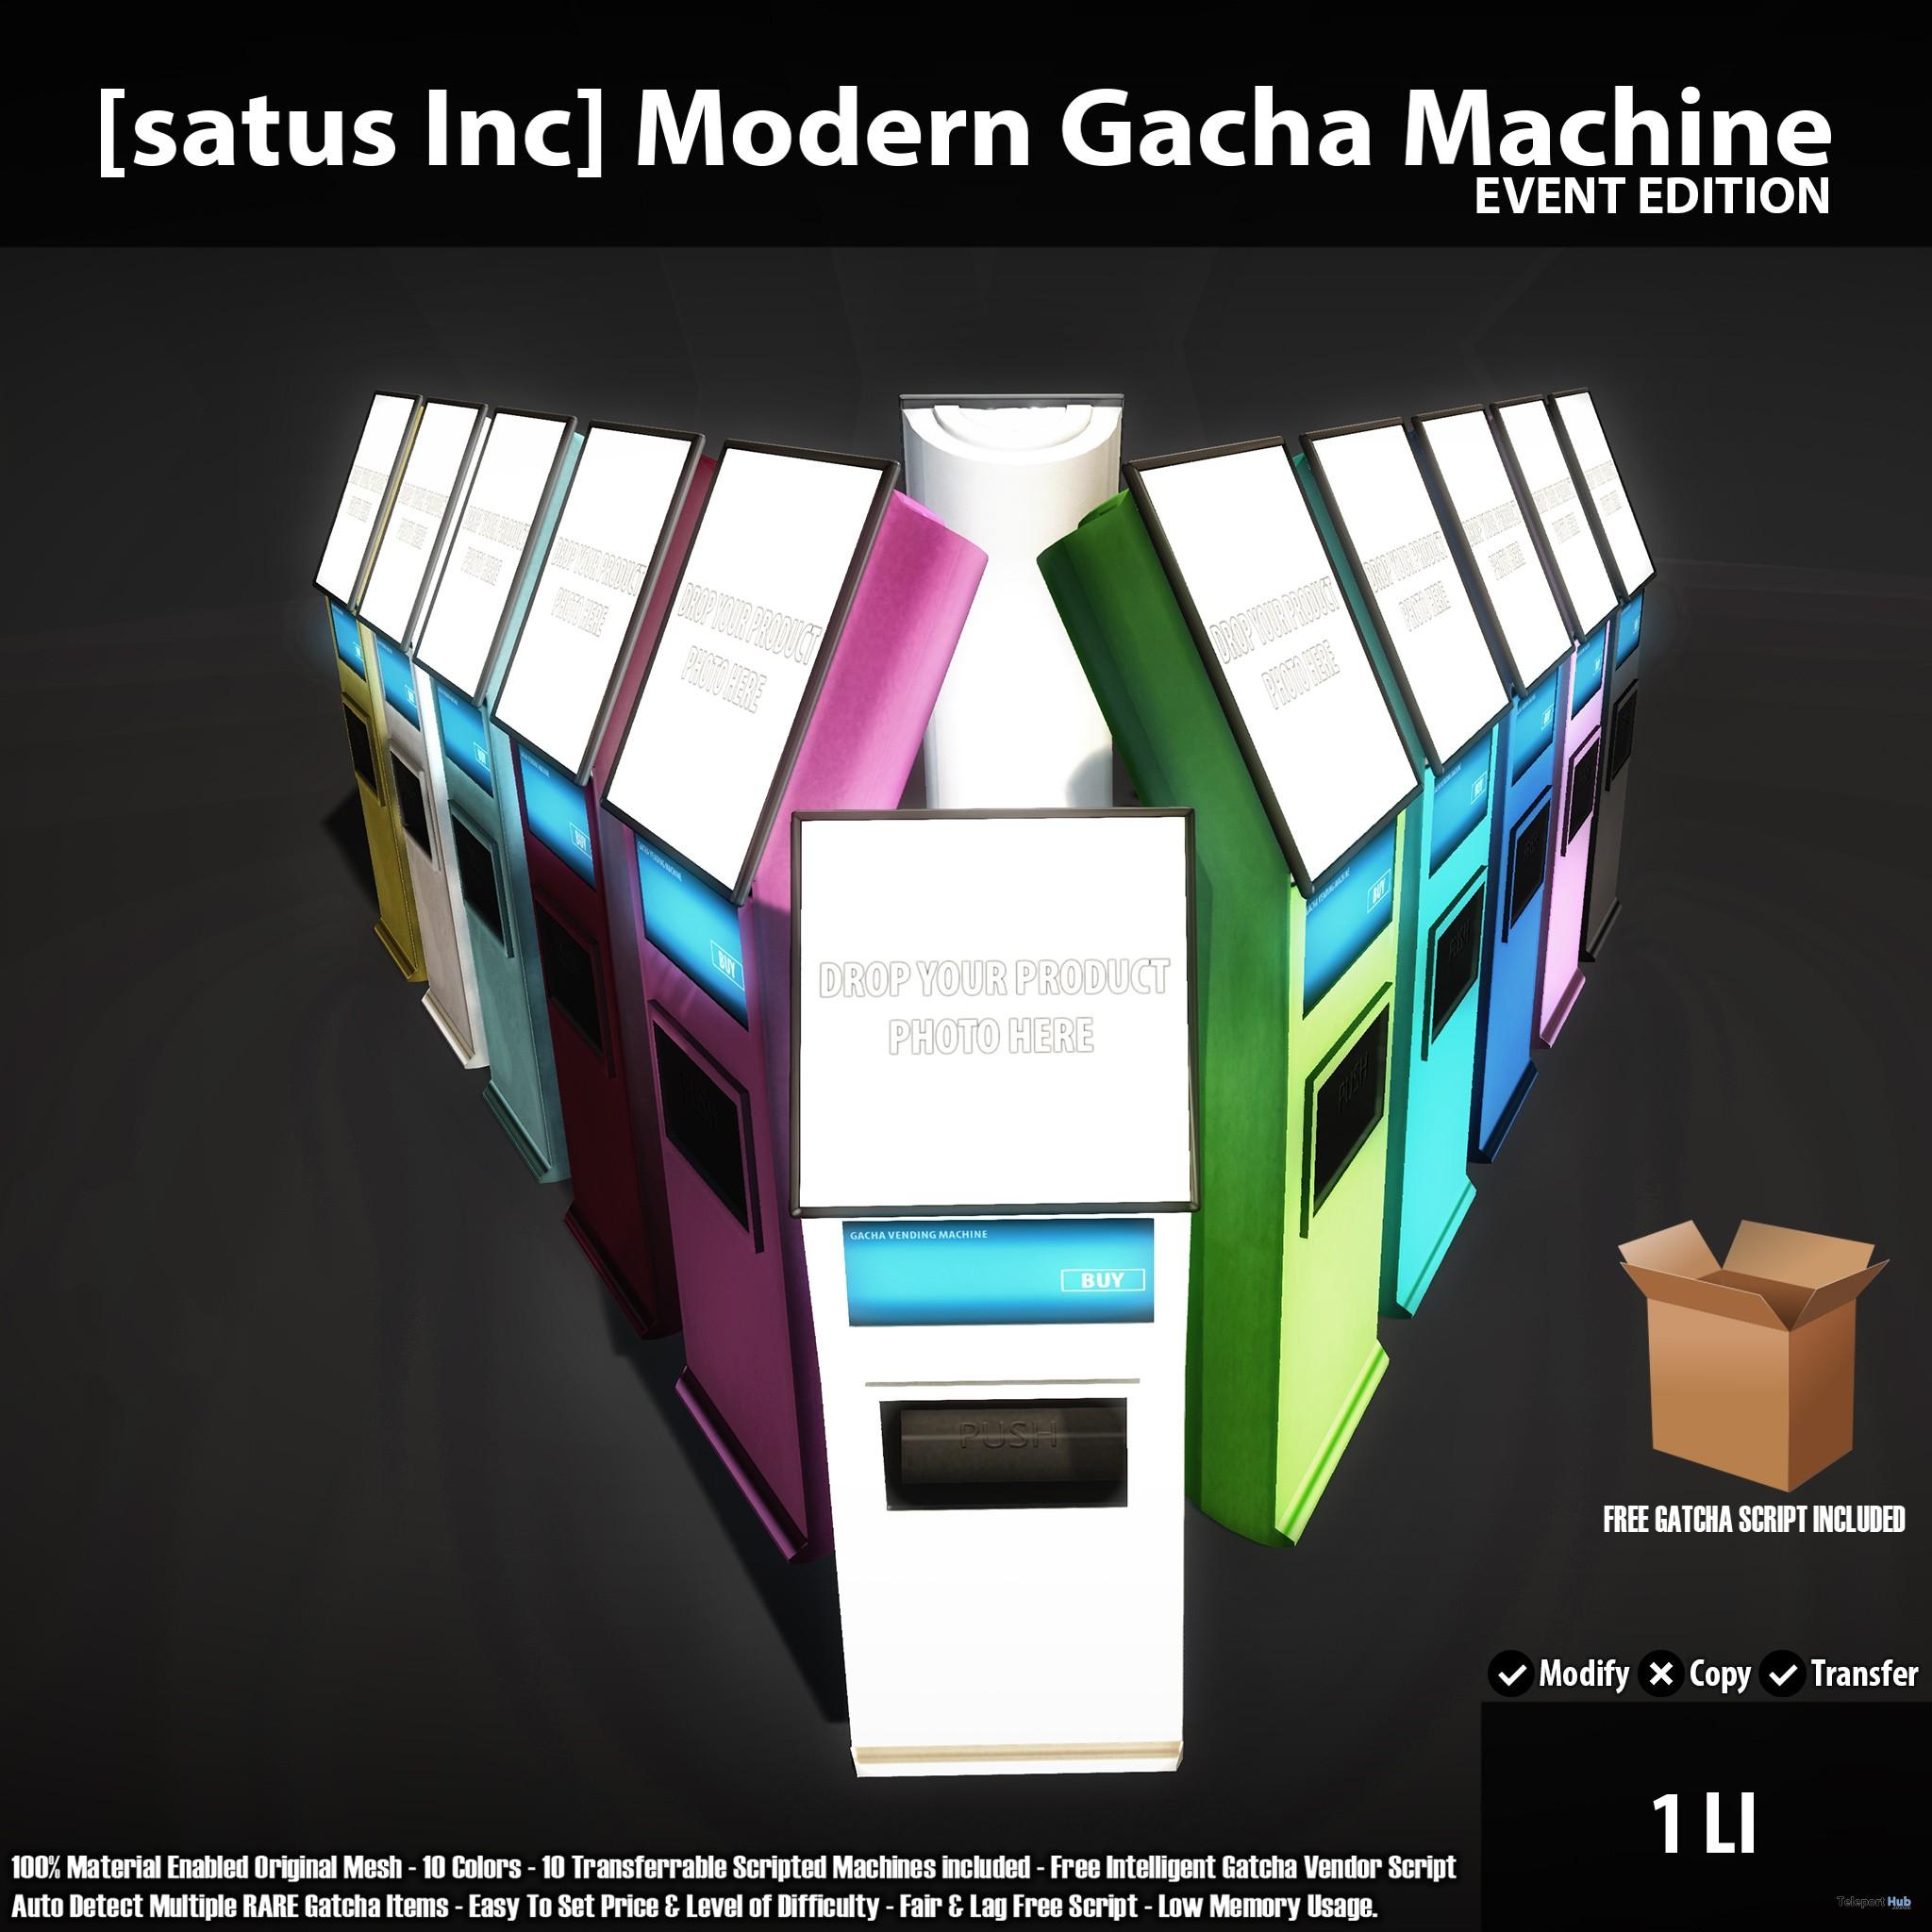 New Release: Modern Gacha Machine Store & Event Editions by [satus Inc] - Teleport Hub - teleporthub.com